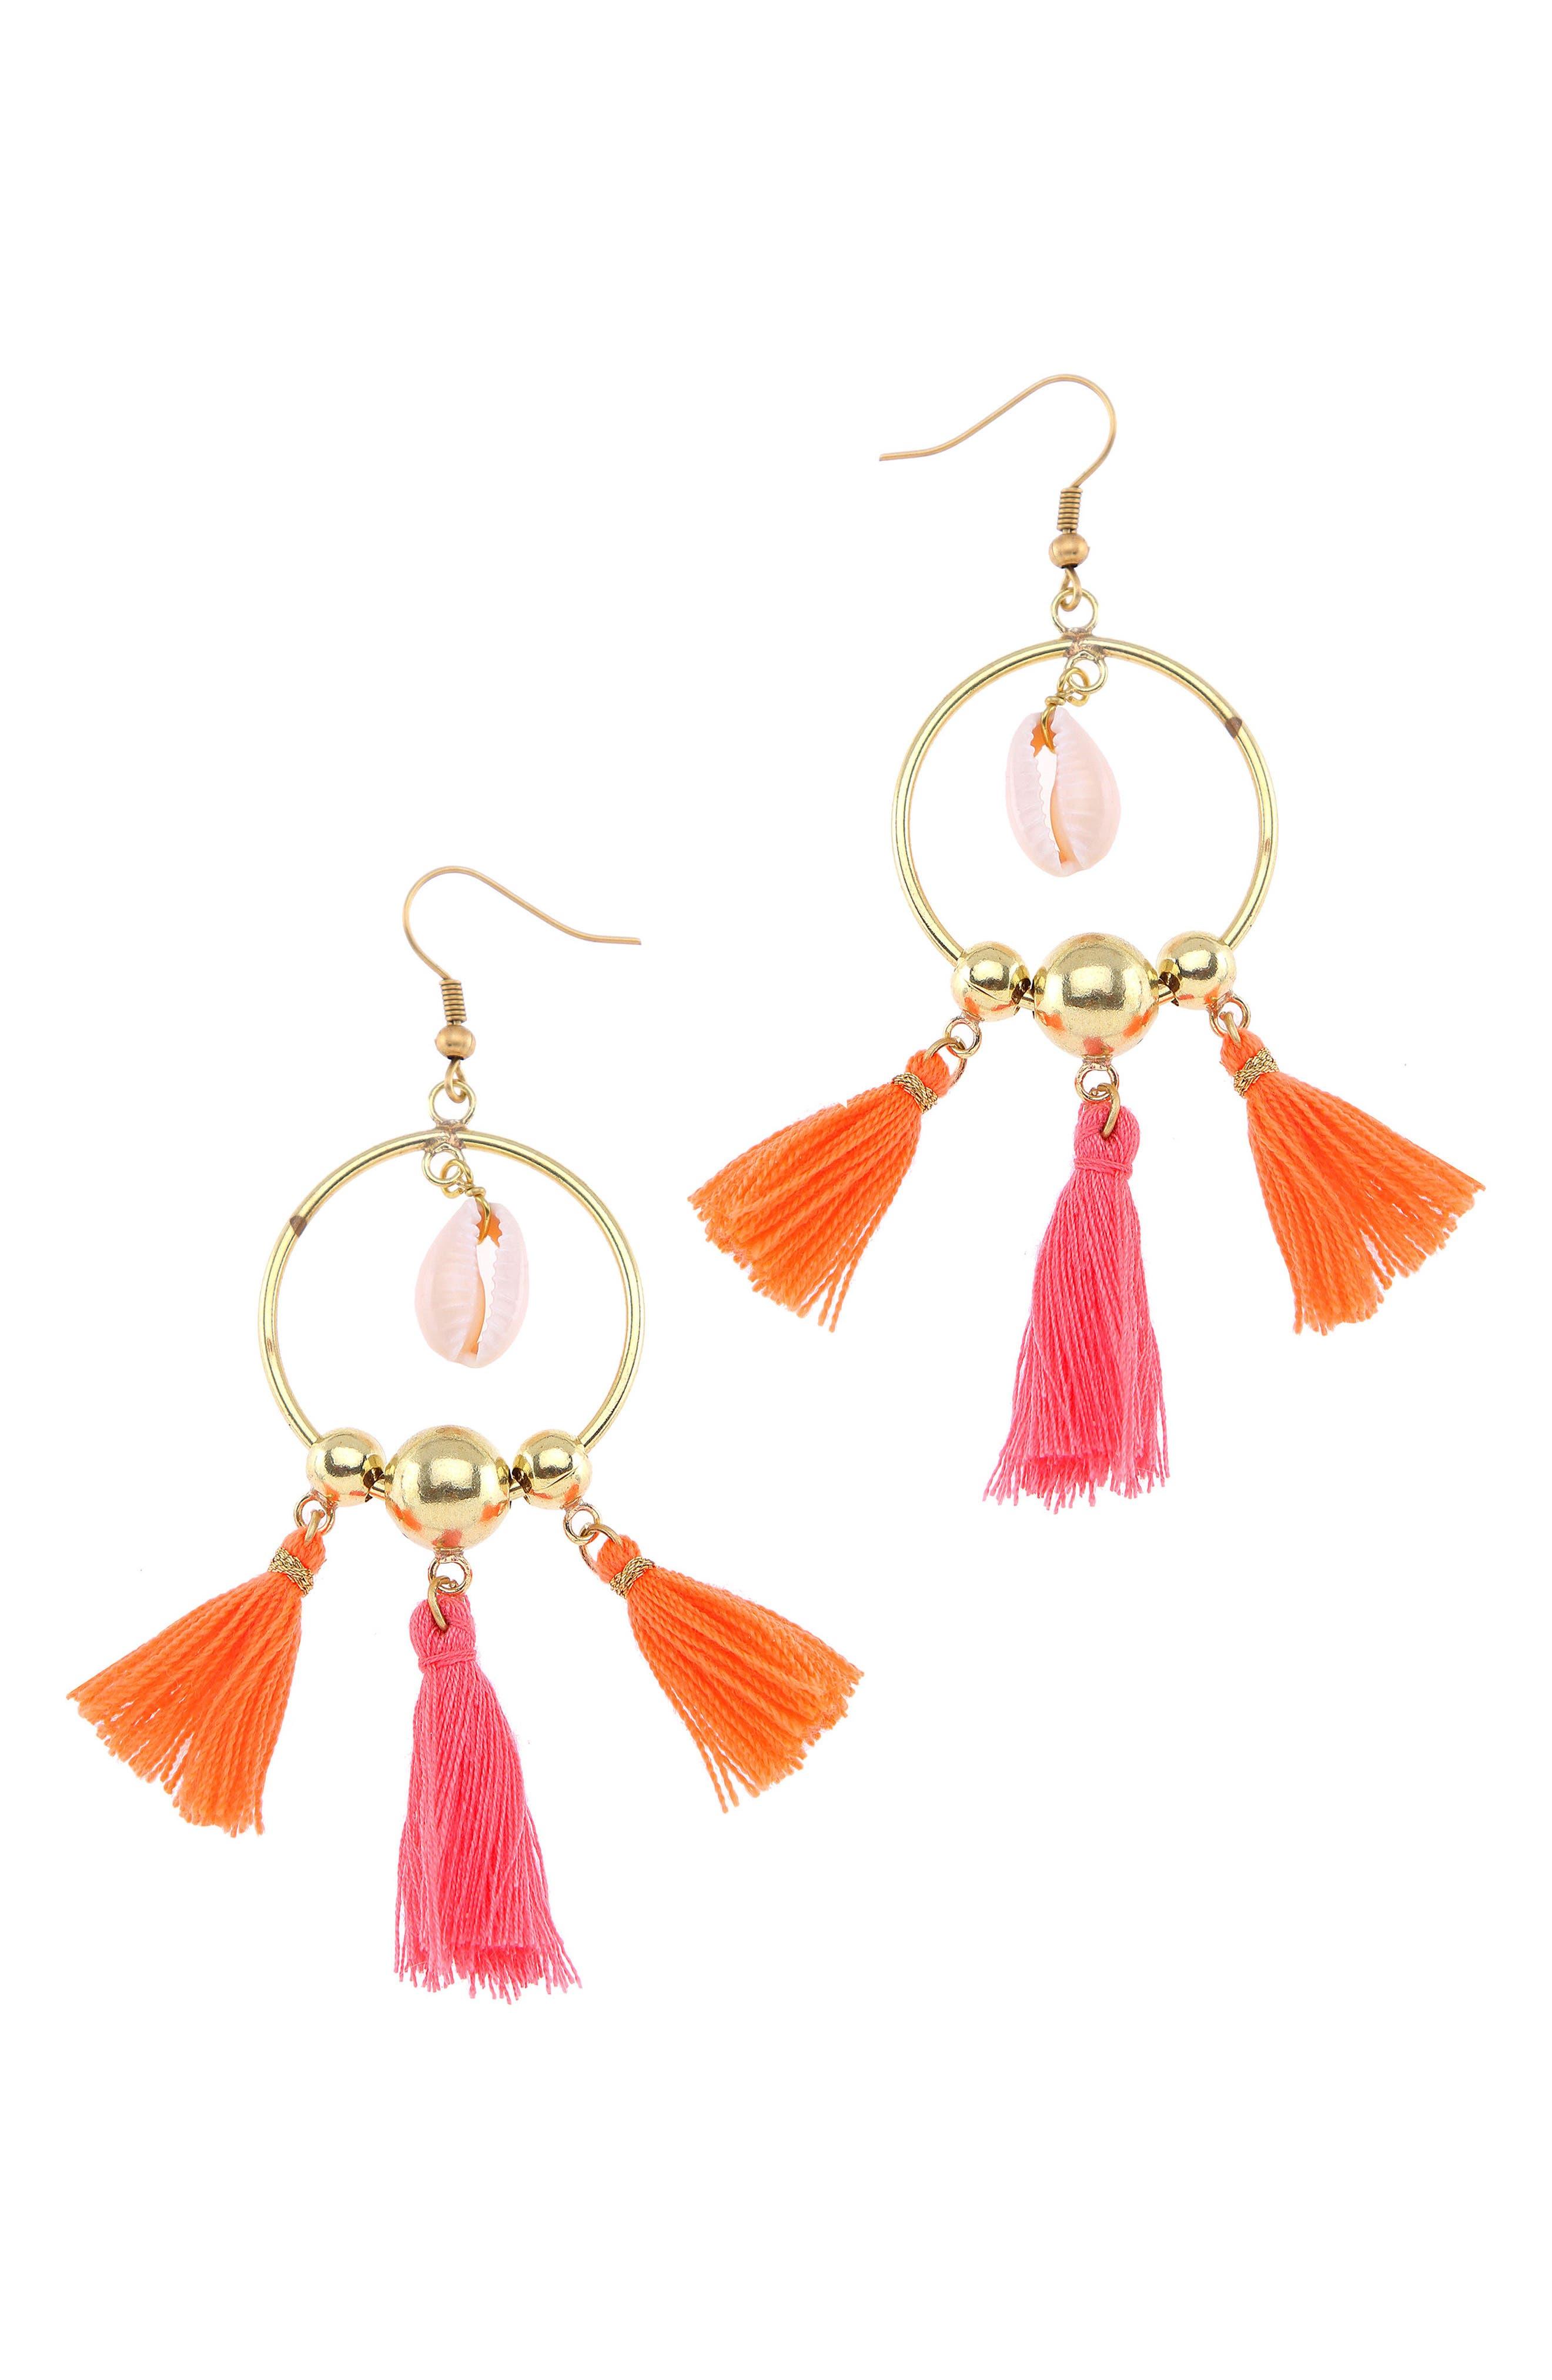 Tiny Tassel Hoop Earrings,                             Main thumbnail 1, color,                             Orange